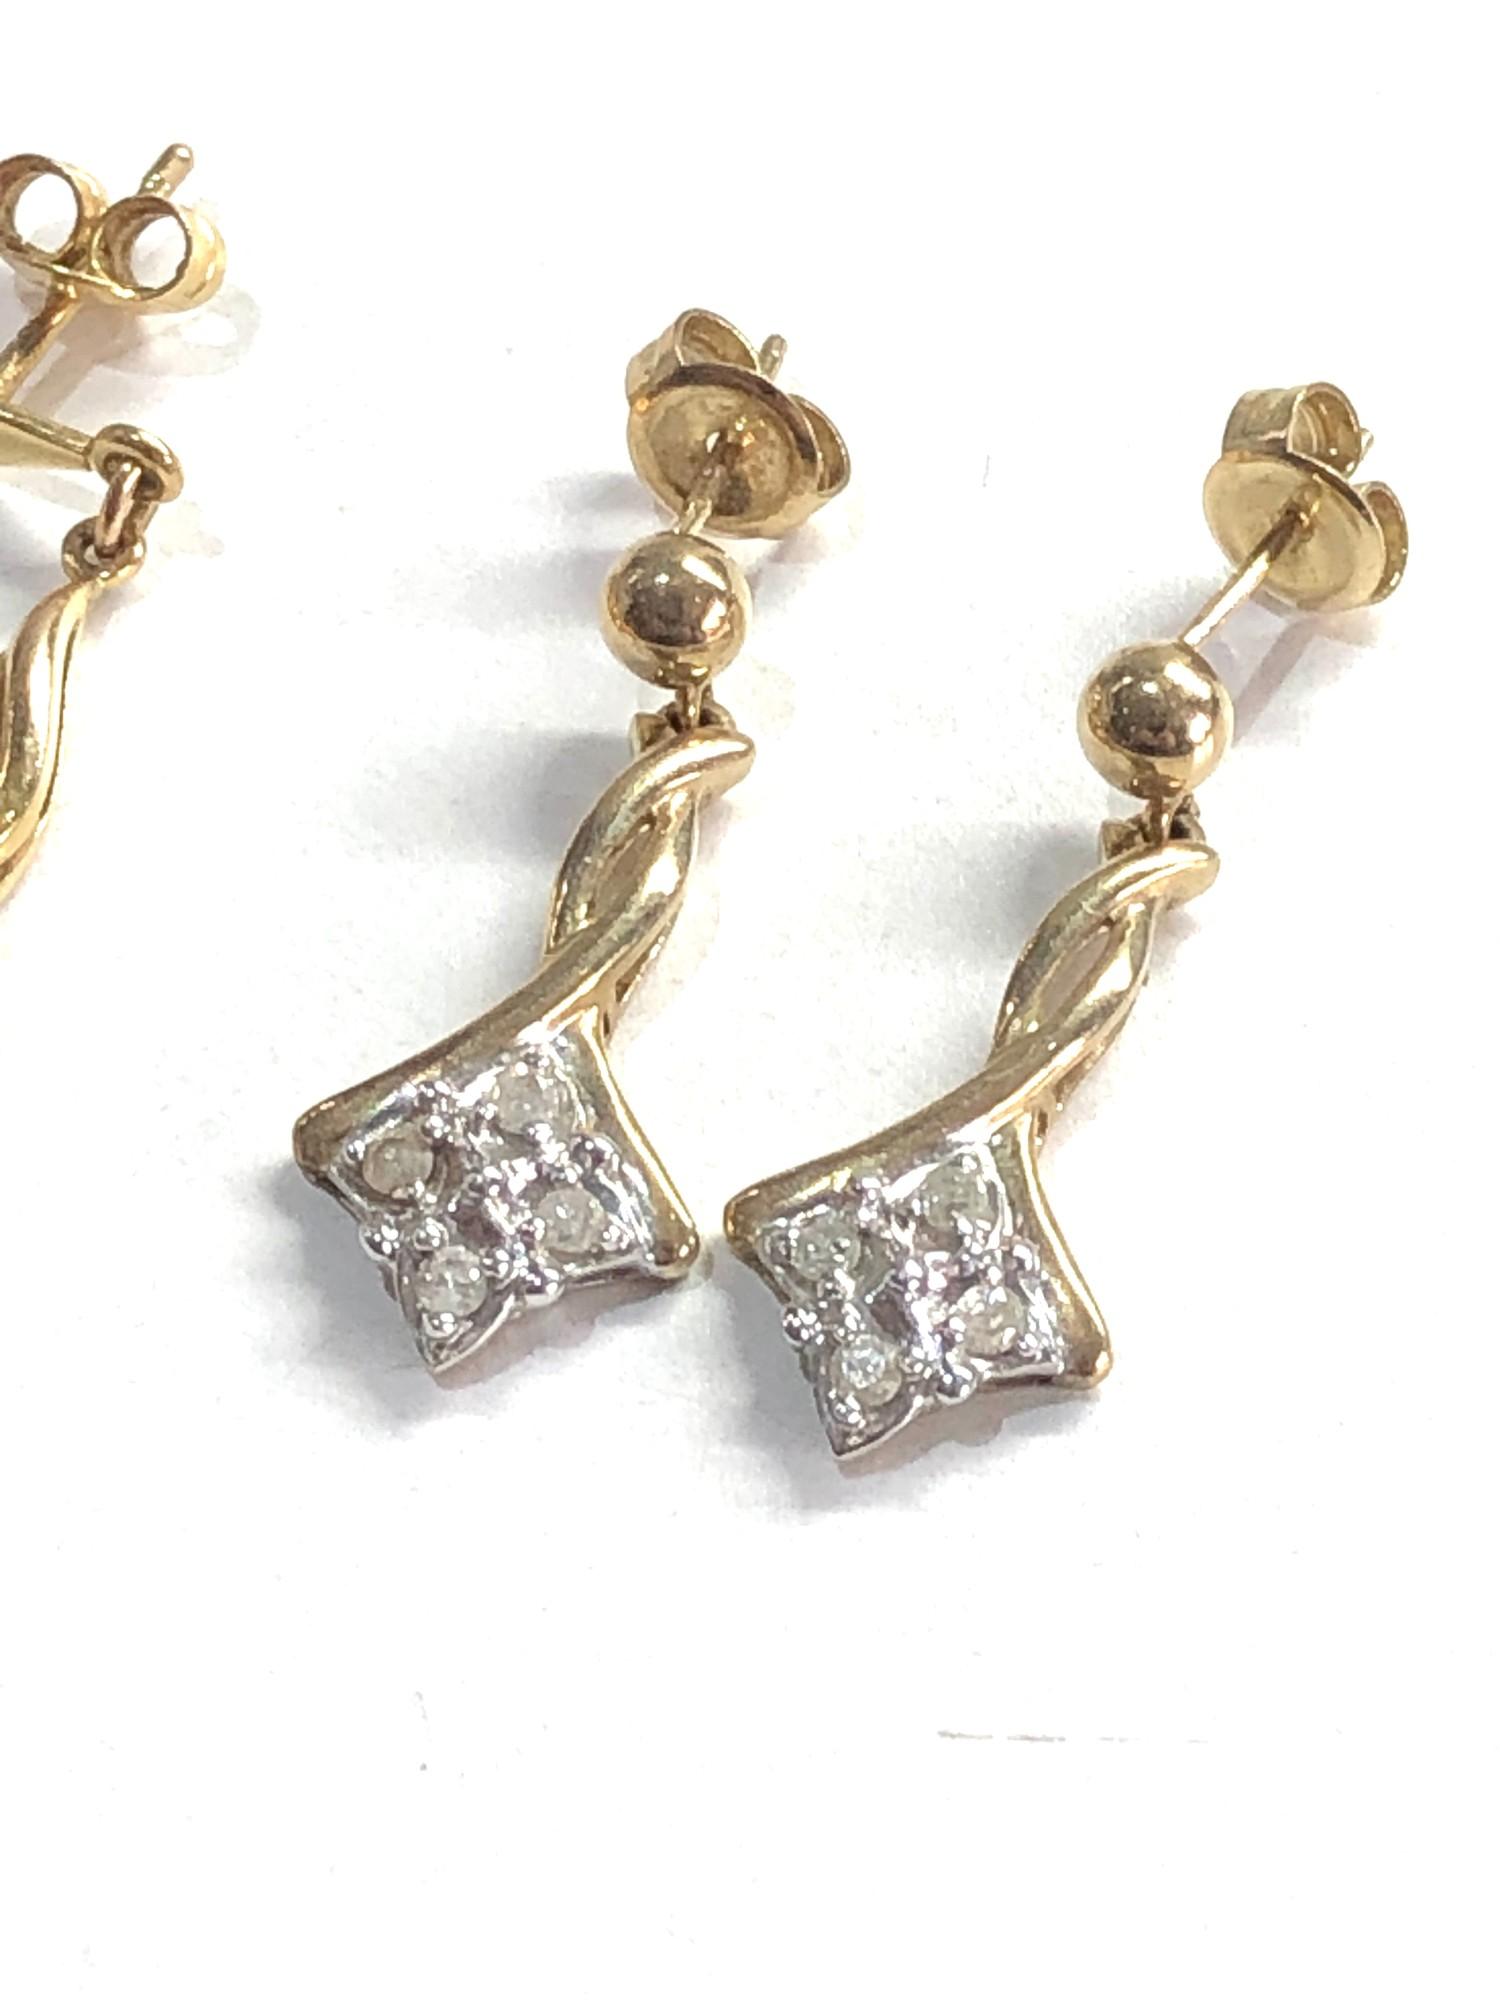 2 x 9ct Gold drop earrings w/ diamond detail 4.9g - Image 3 of 3